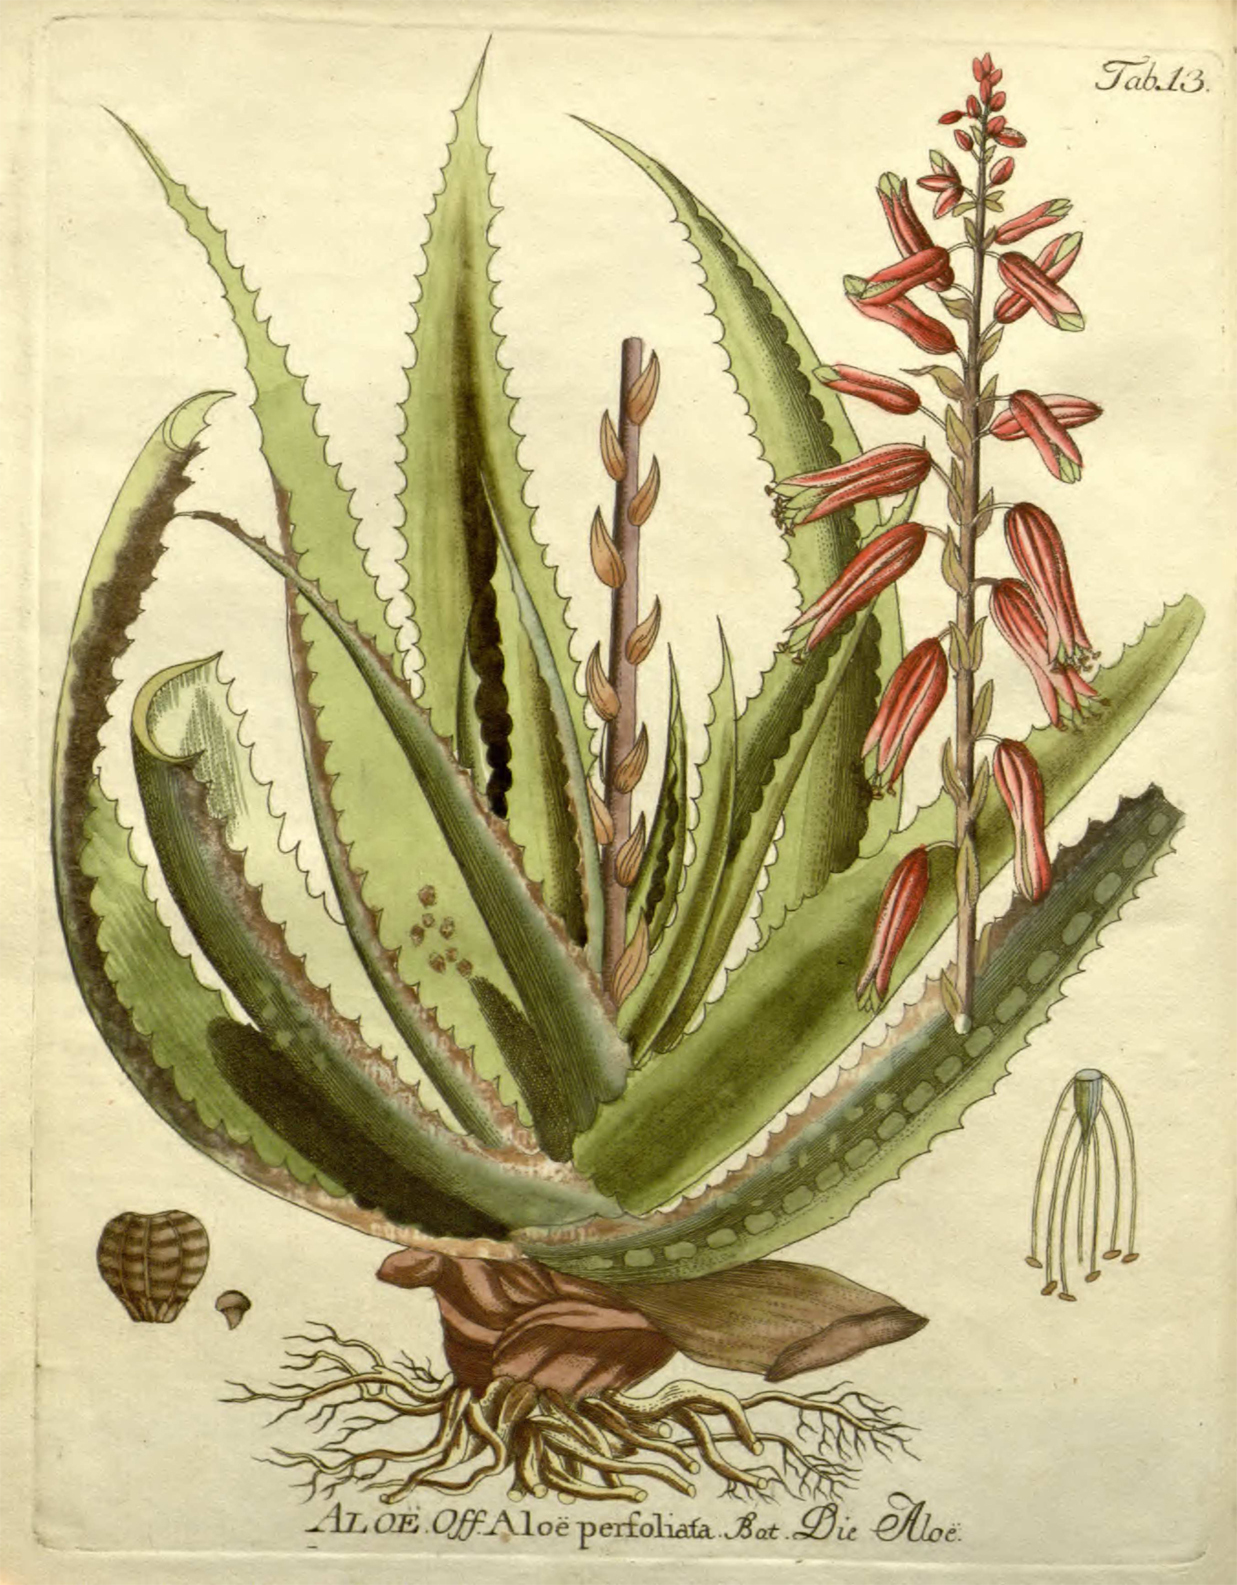 Aloe-vera-illustration